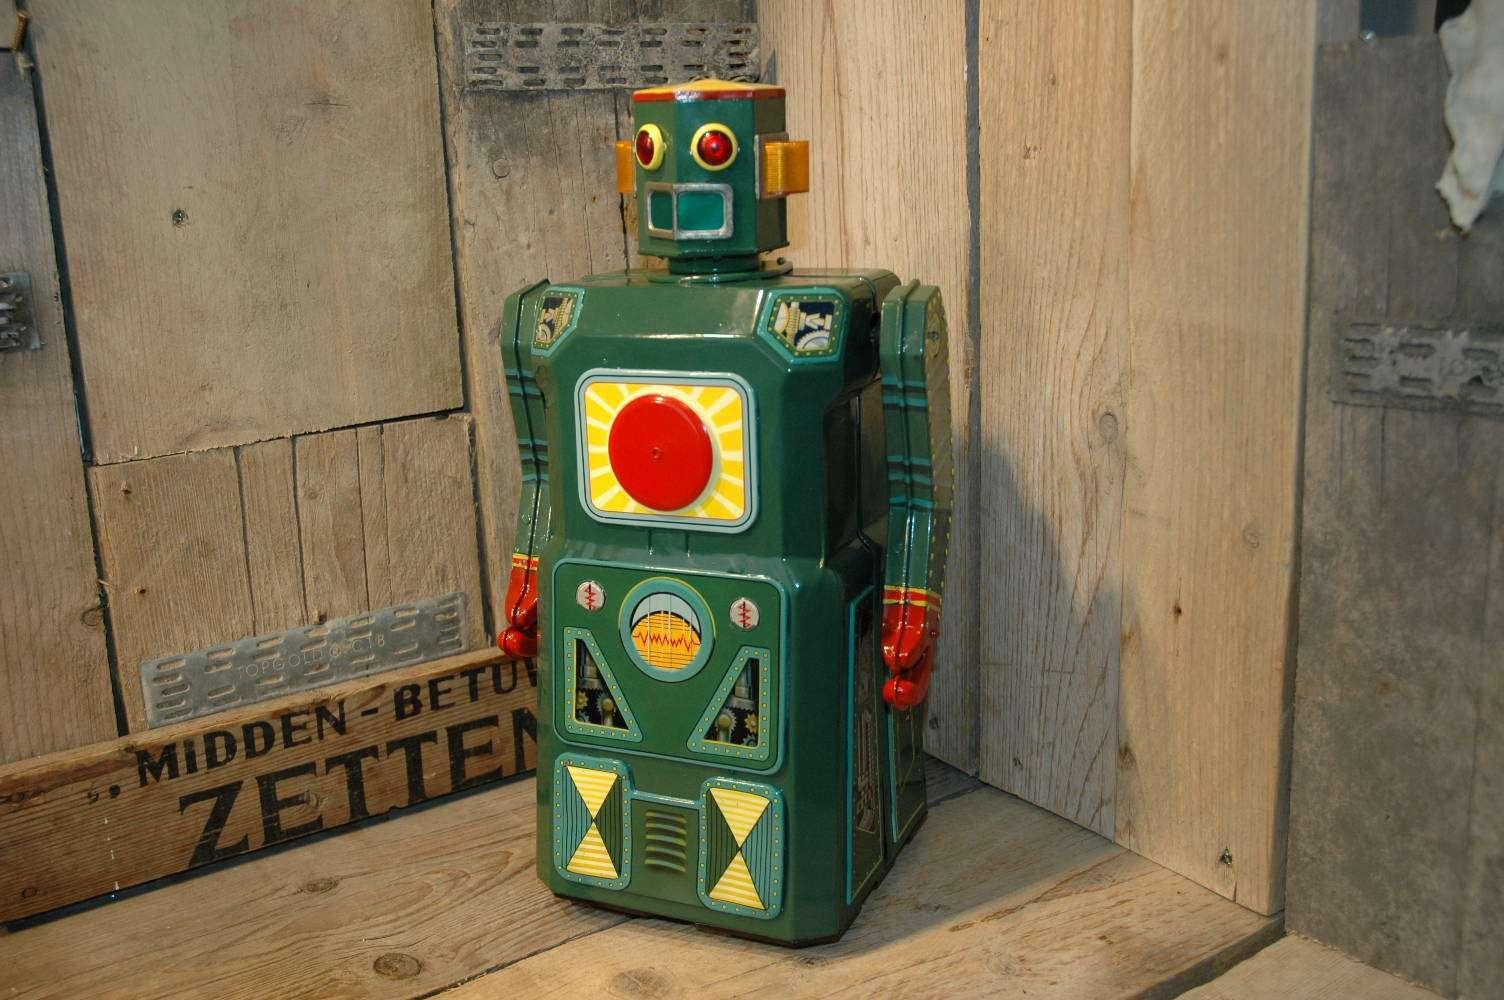 VST / Modern Toys - Shooting Giant Robot Prototype